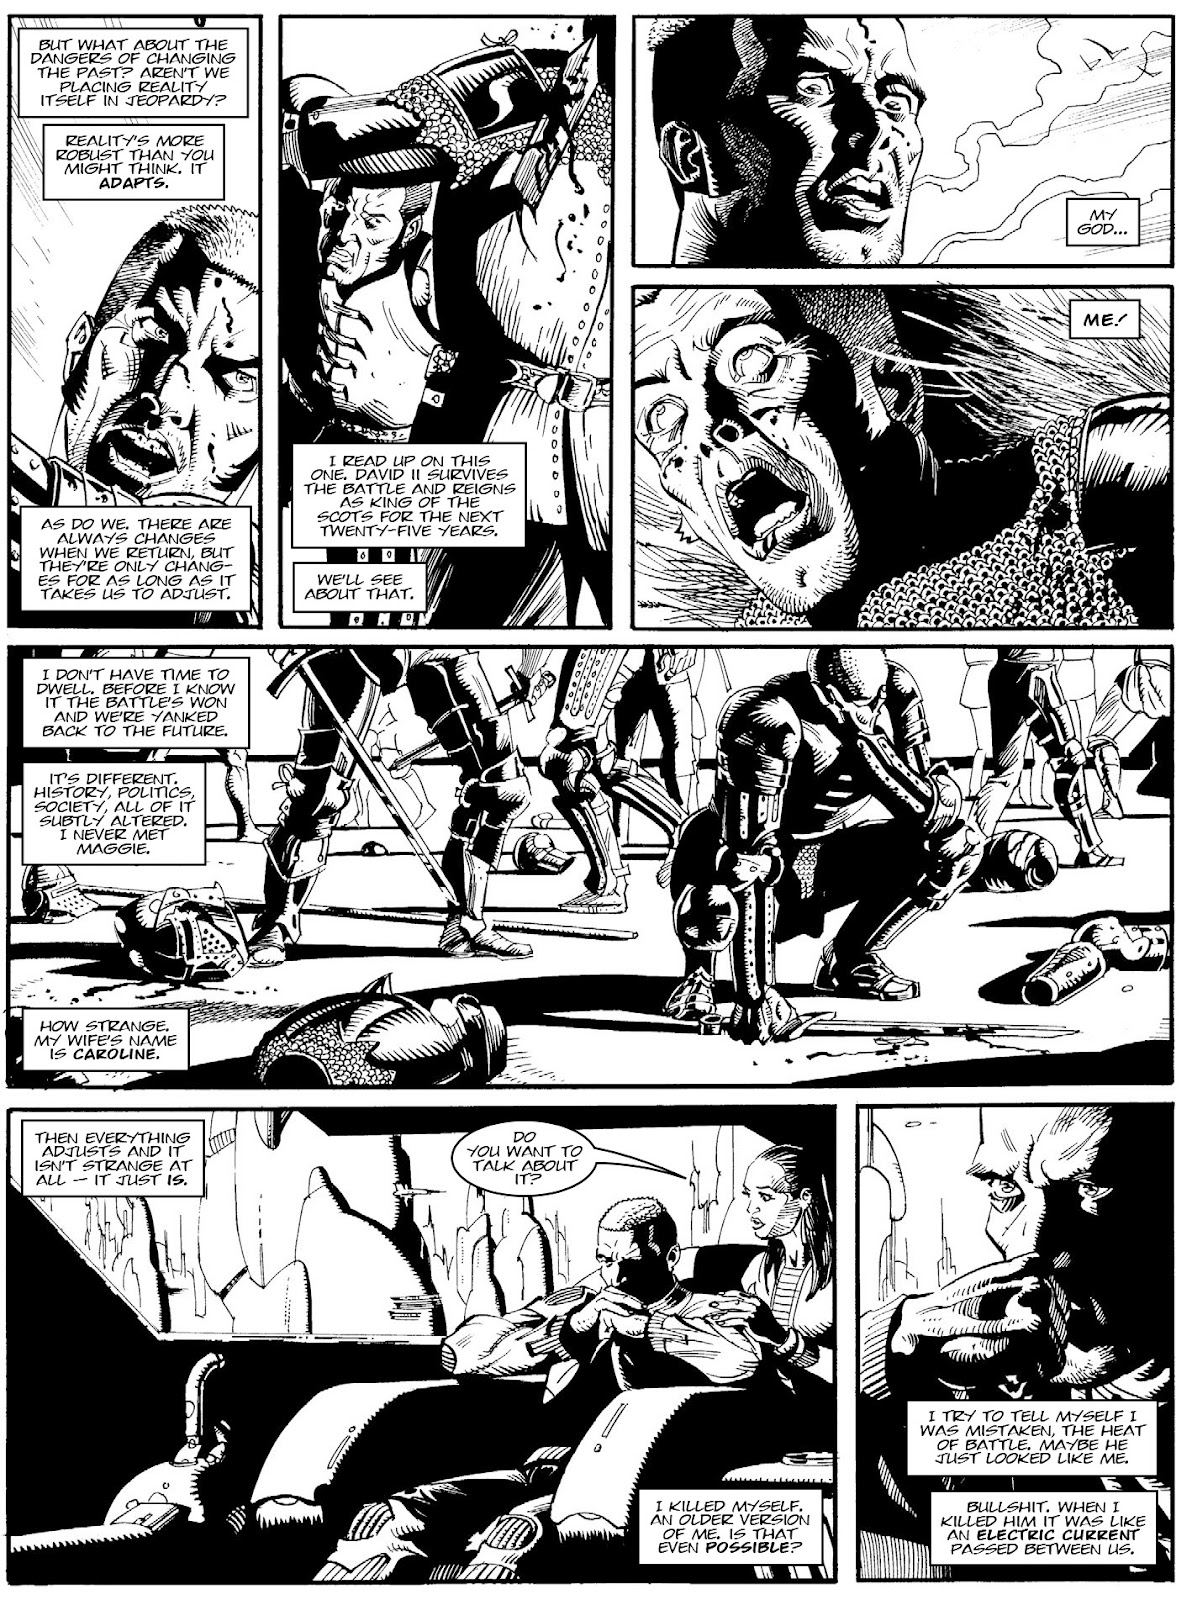 Judge Dredd Megazine (Vol. 5) issue 427 - Page 111